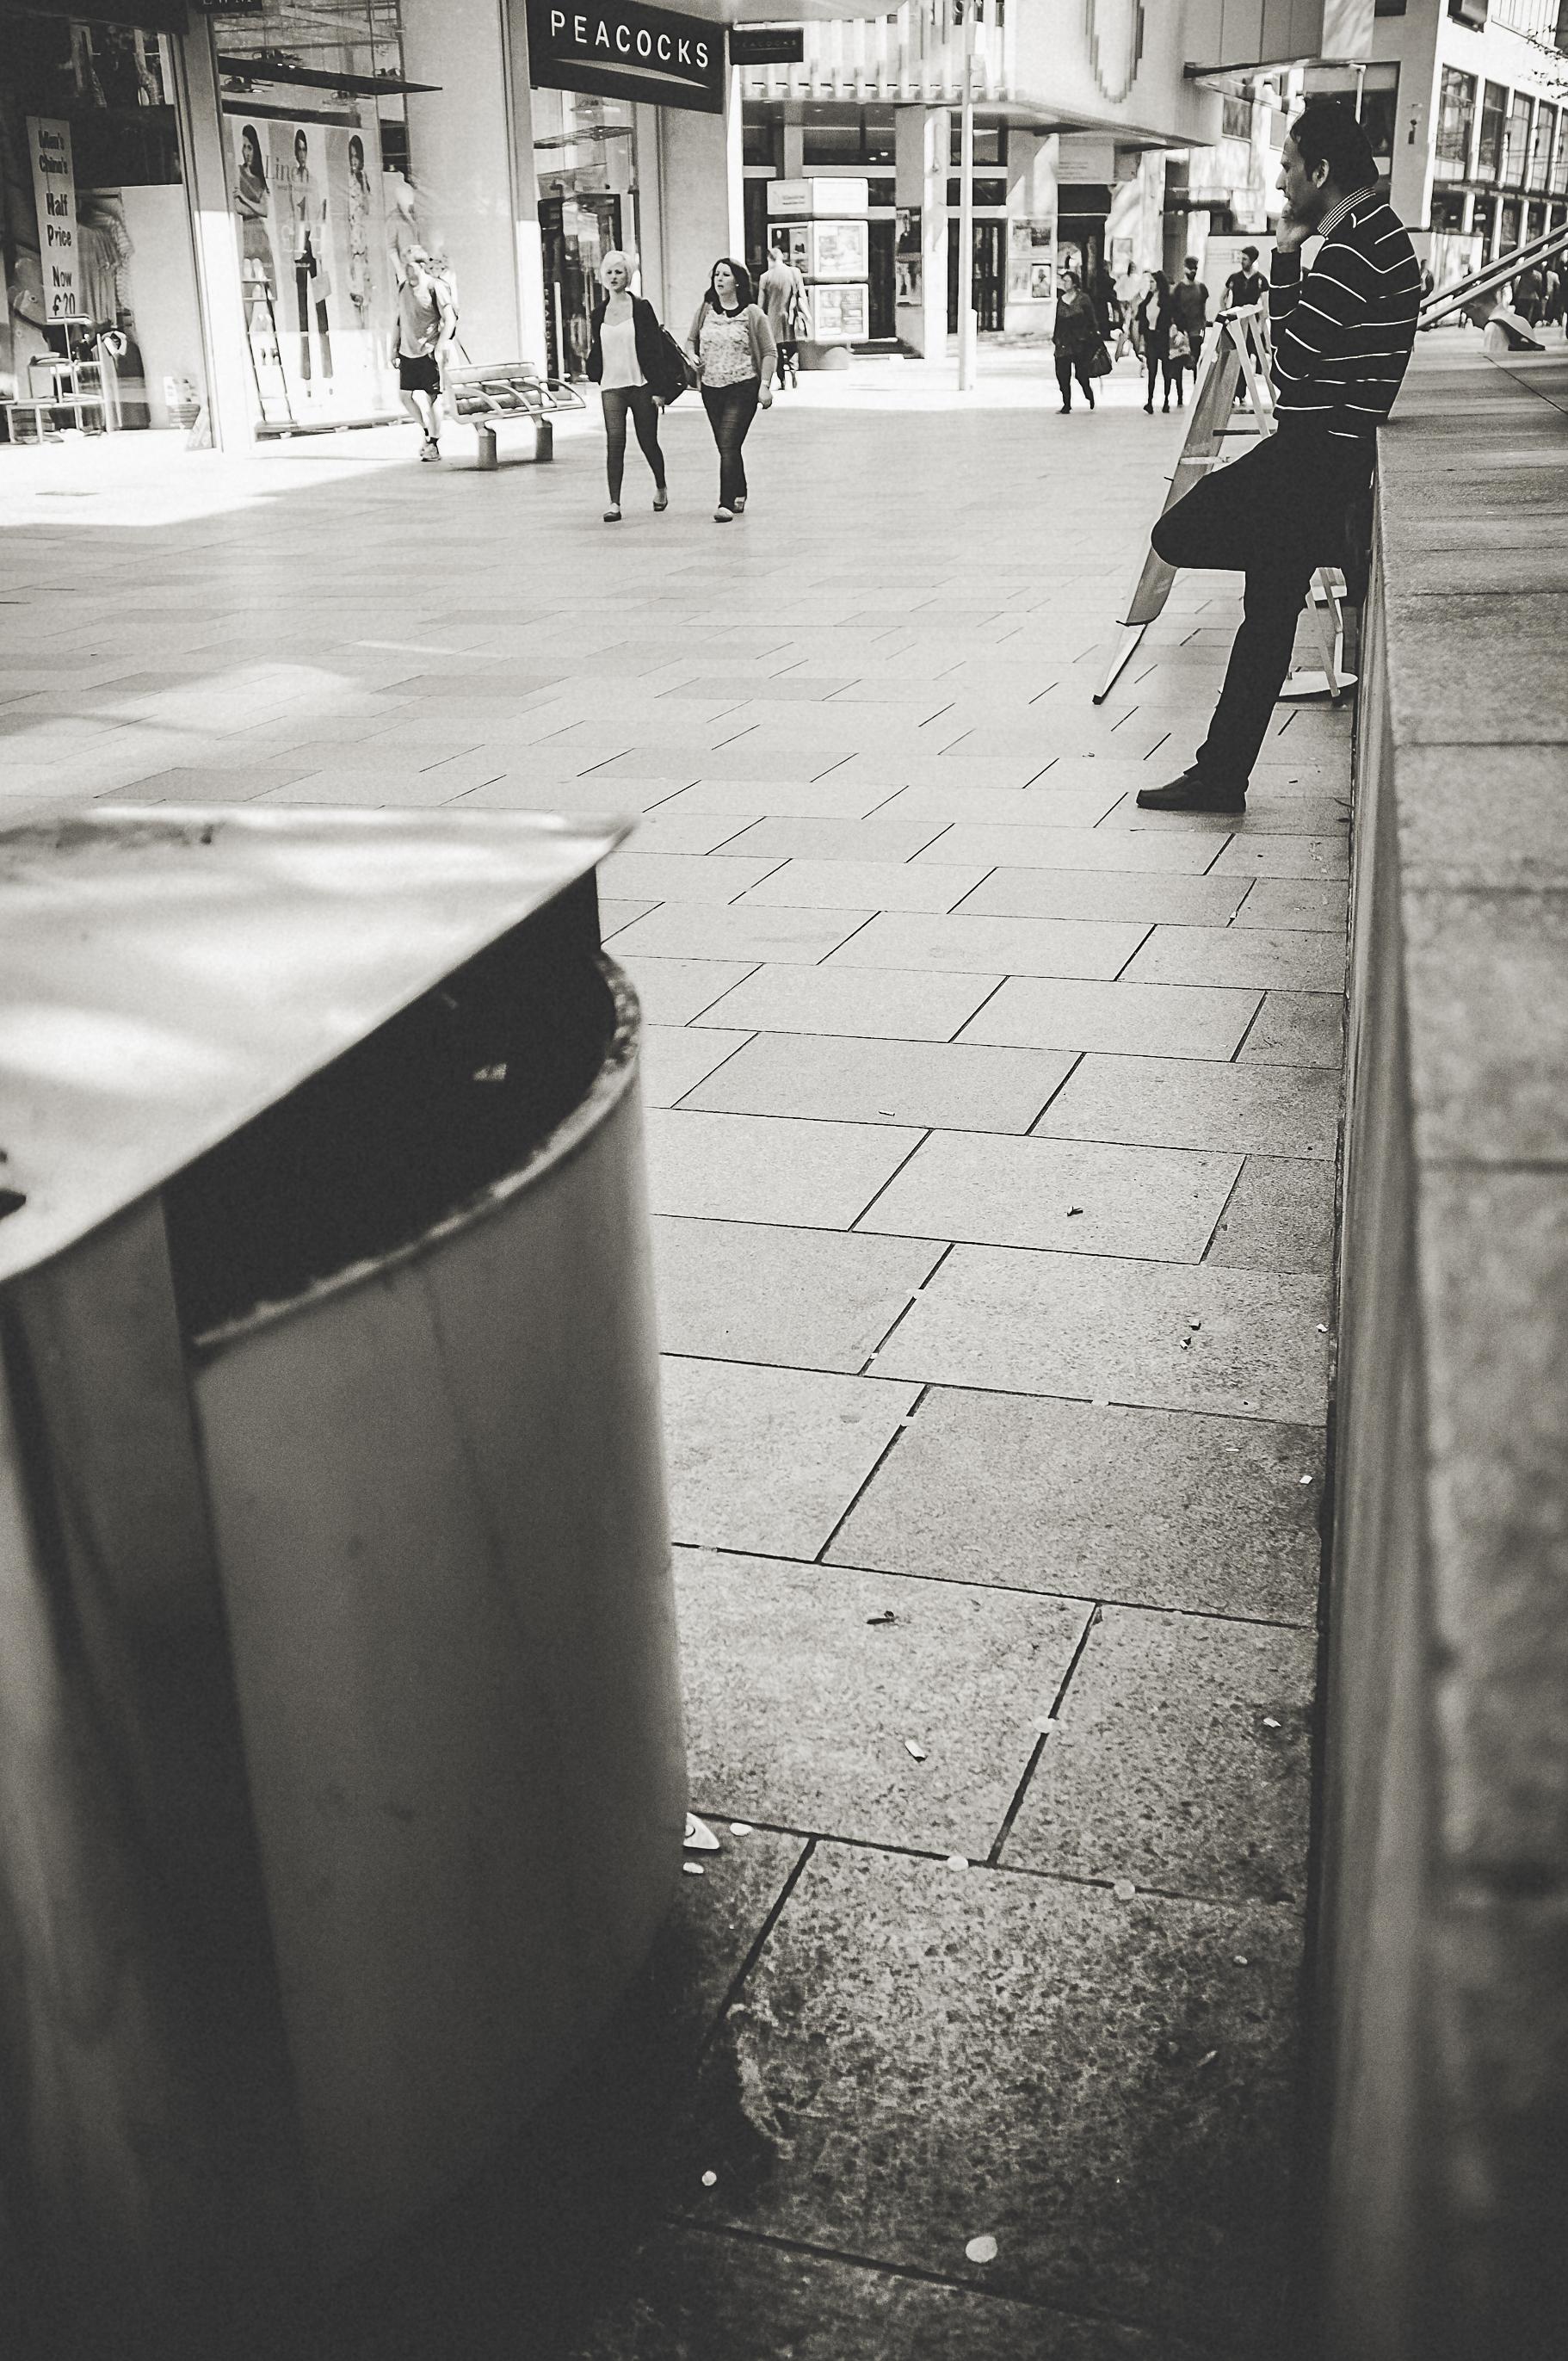 cardiff_street_photography_with_the_fuji_x100-30.jpg